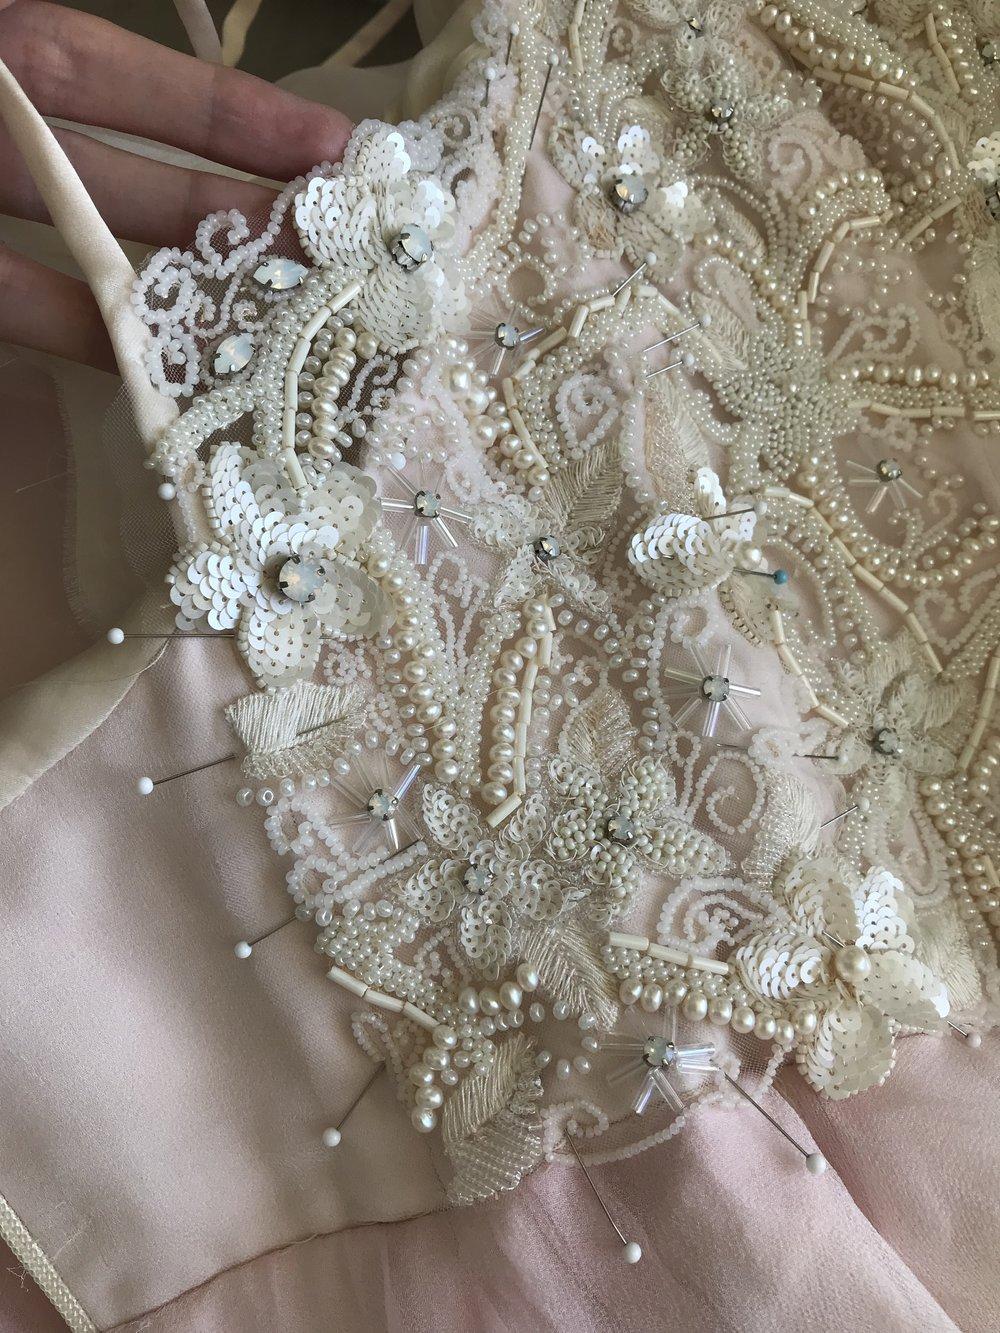 sewing sheer overlay to wedding dress